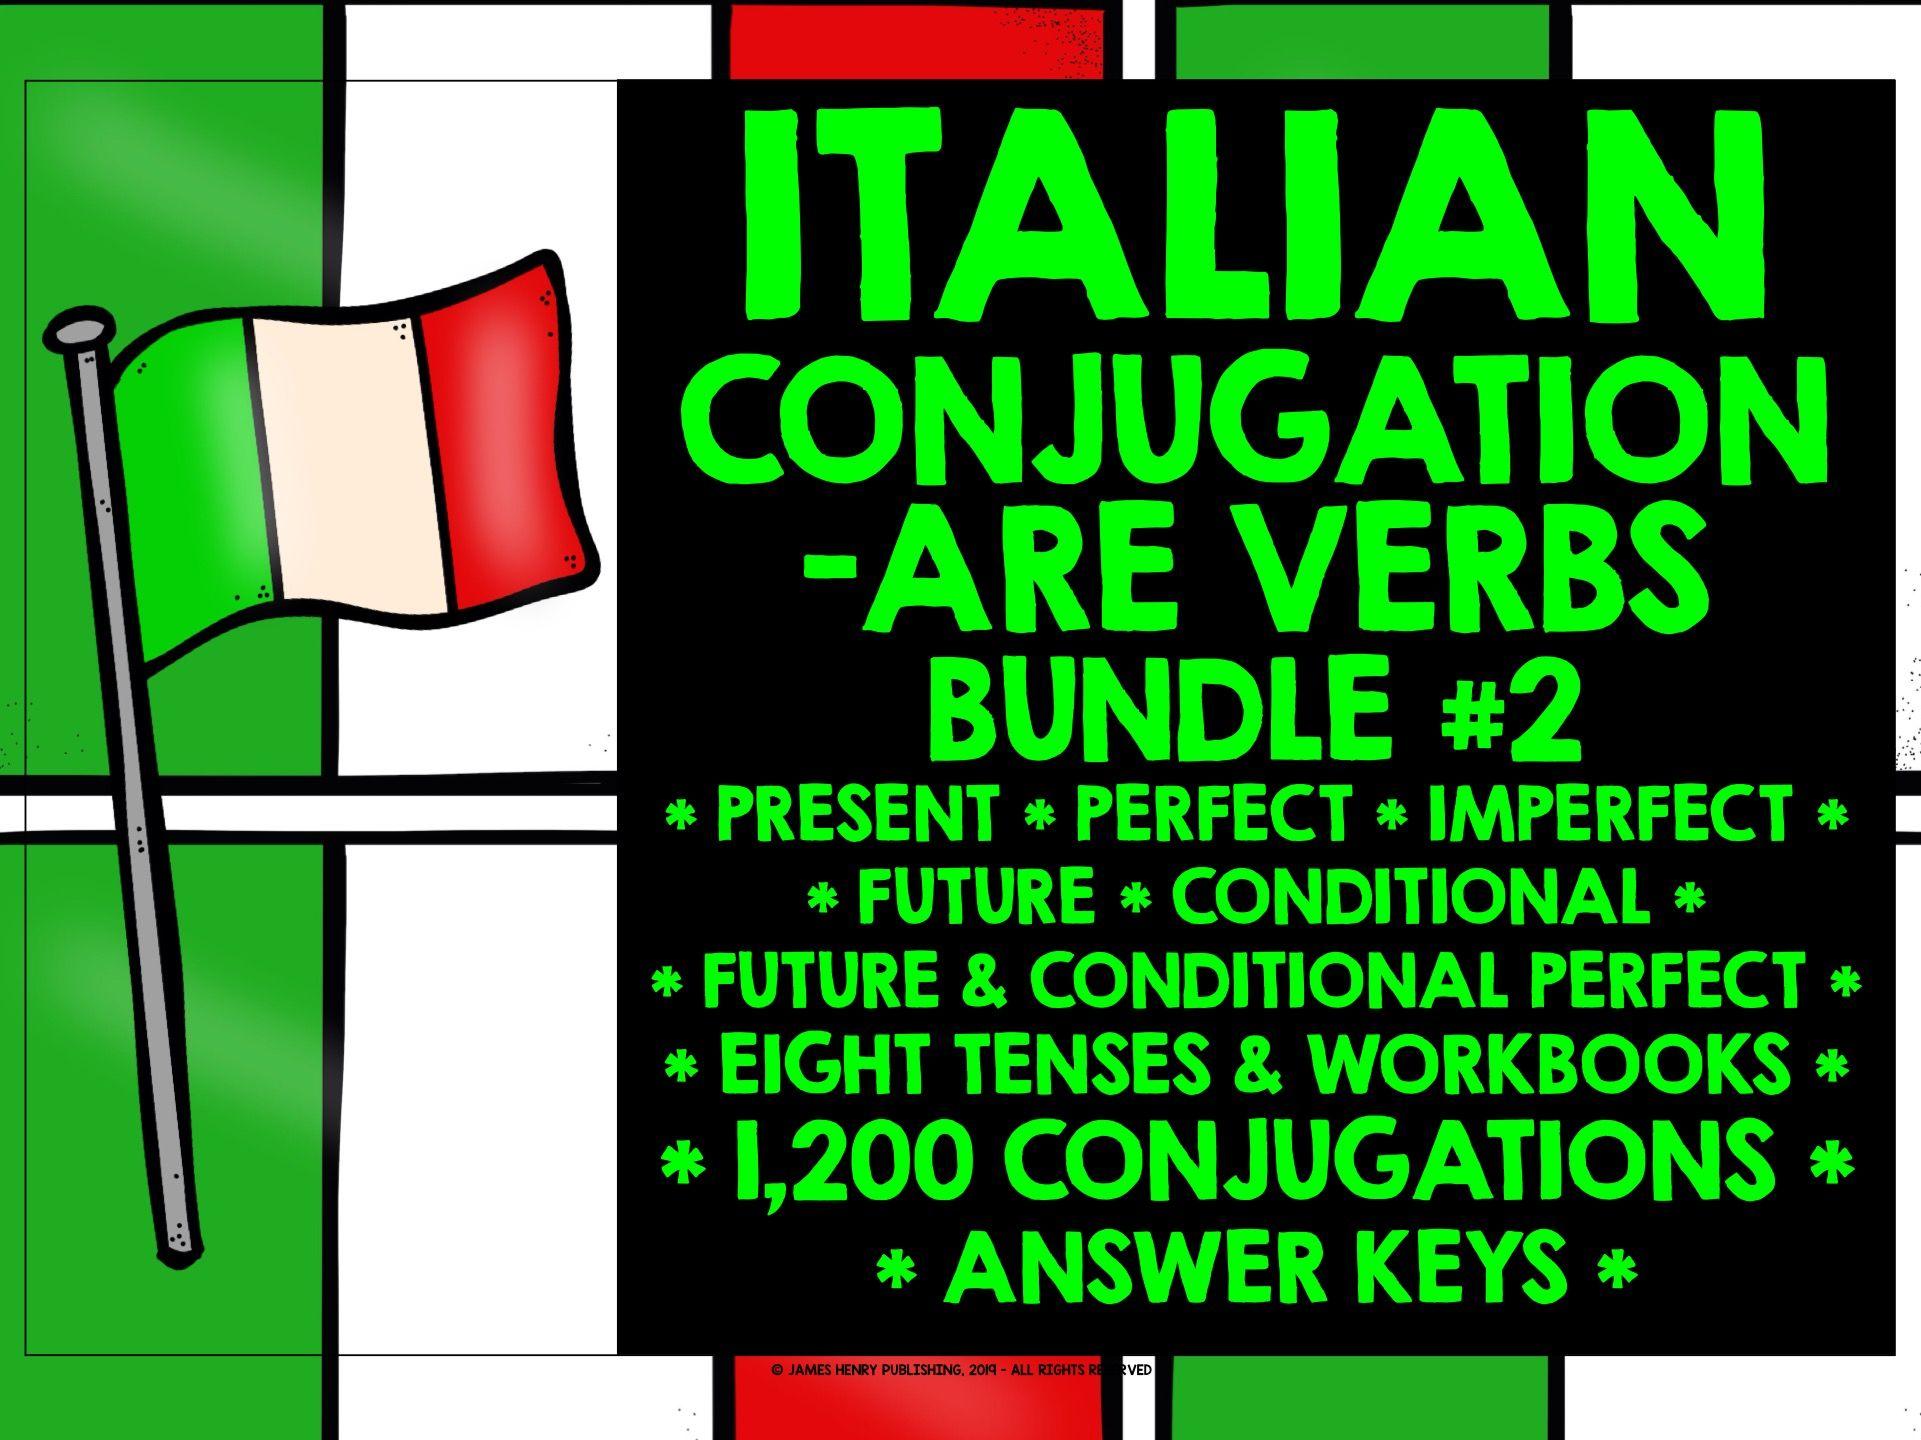 ITALIAN -ARE VERBS CONJUGATION BUNDLE #2